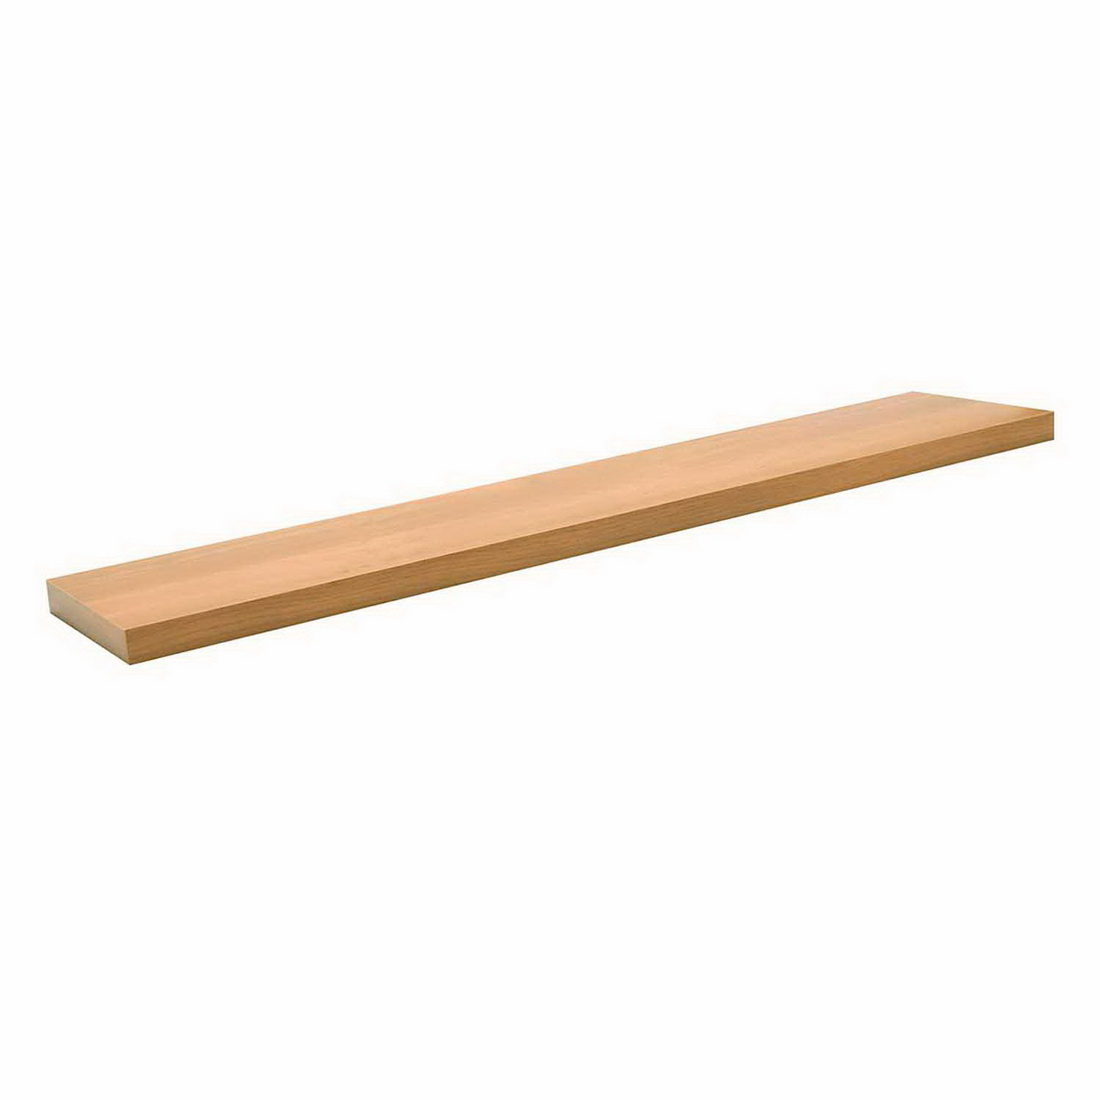 1200x250x38mm Floating Shelf Scandi Oak